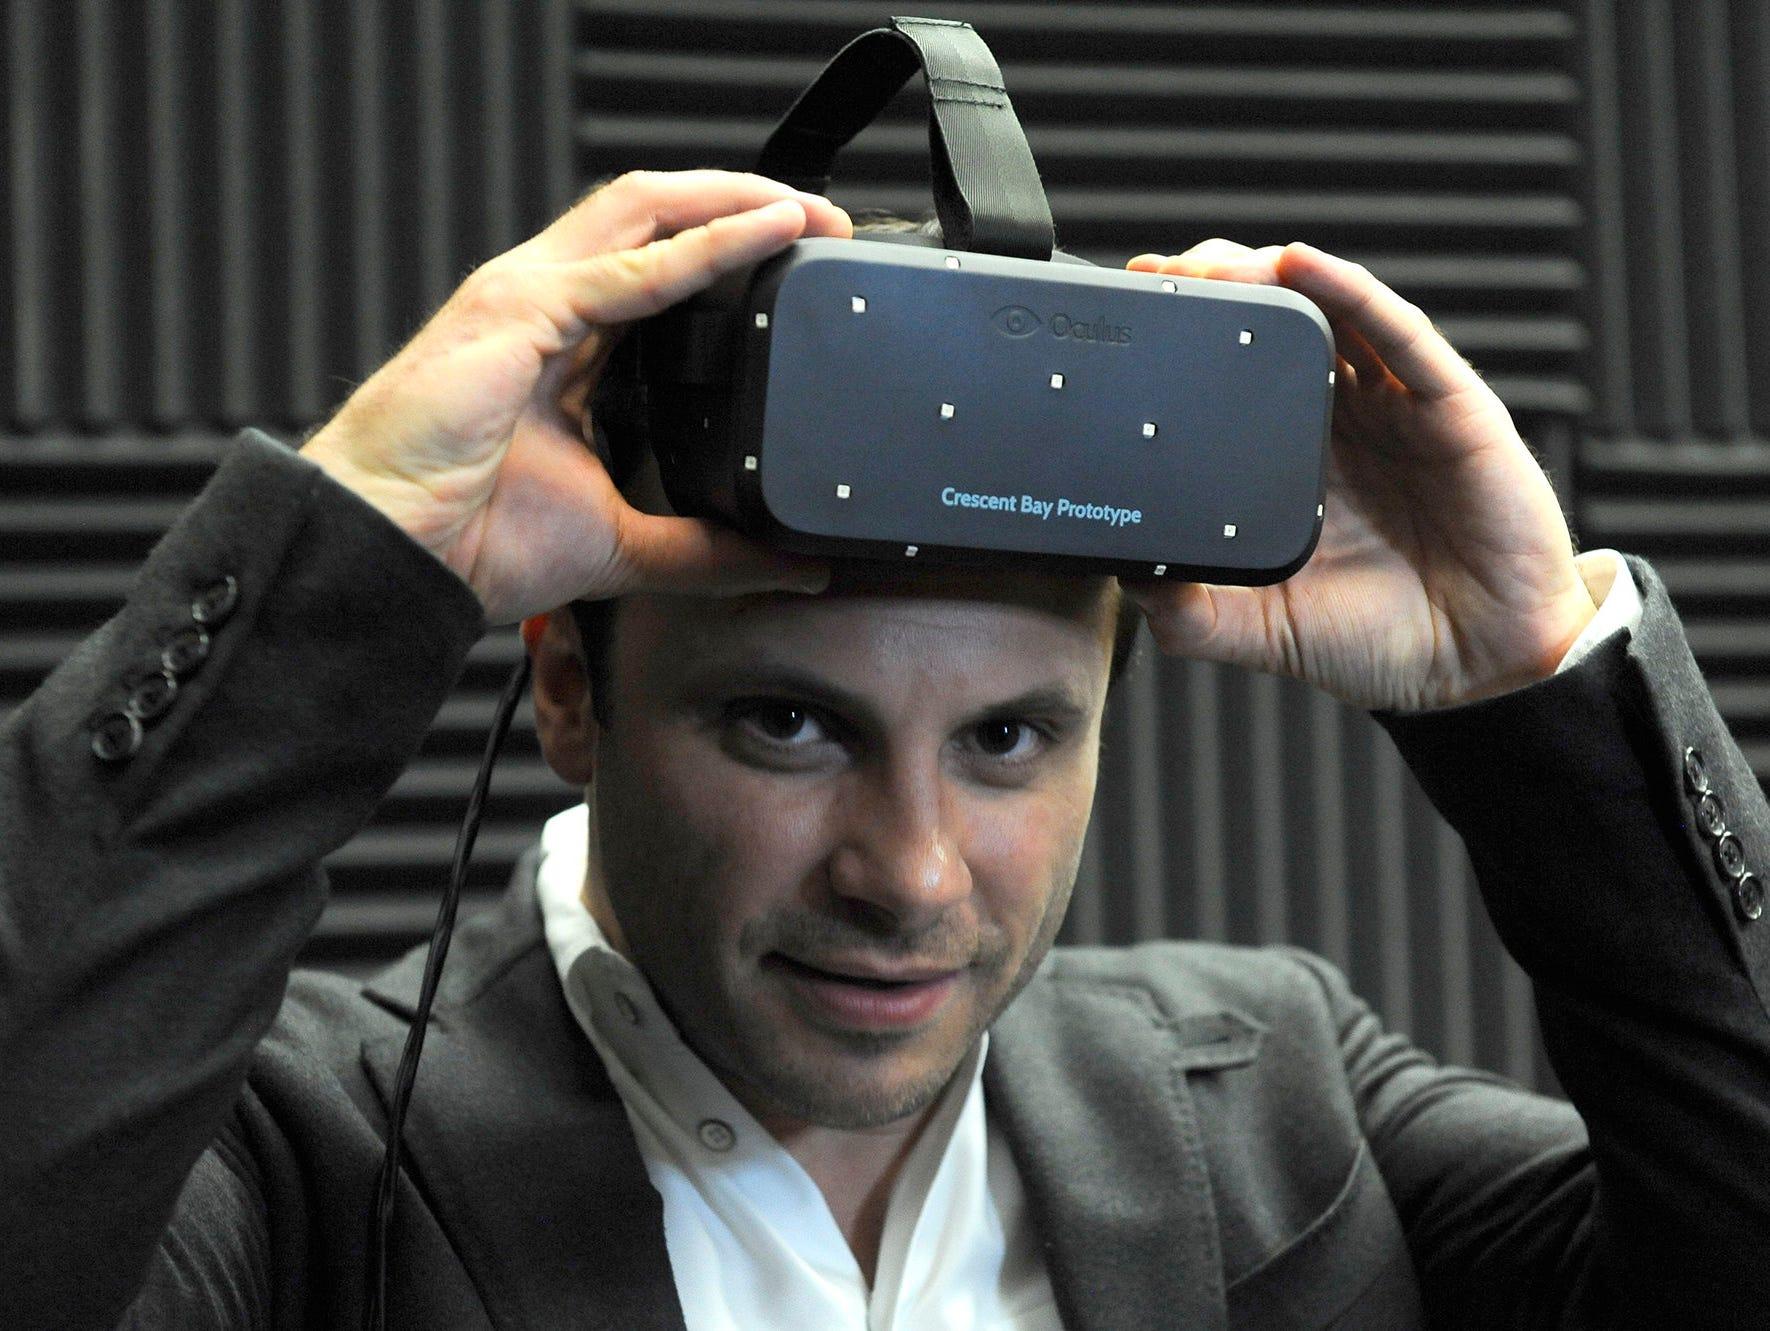 Oculus VR CEO Brendan Iribe shows off Oculus Rift.